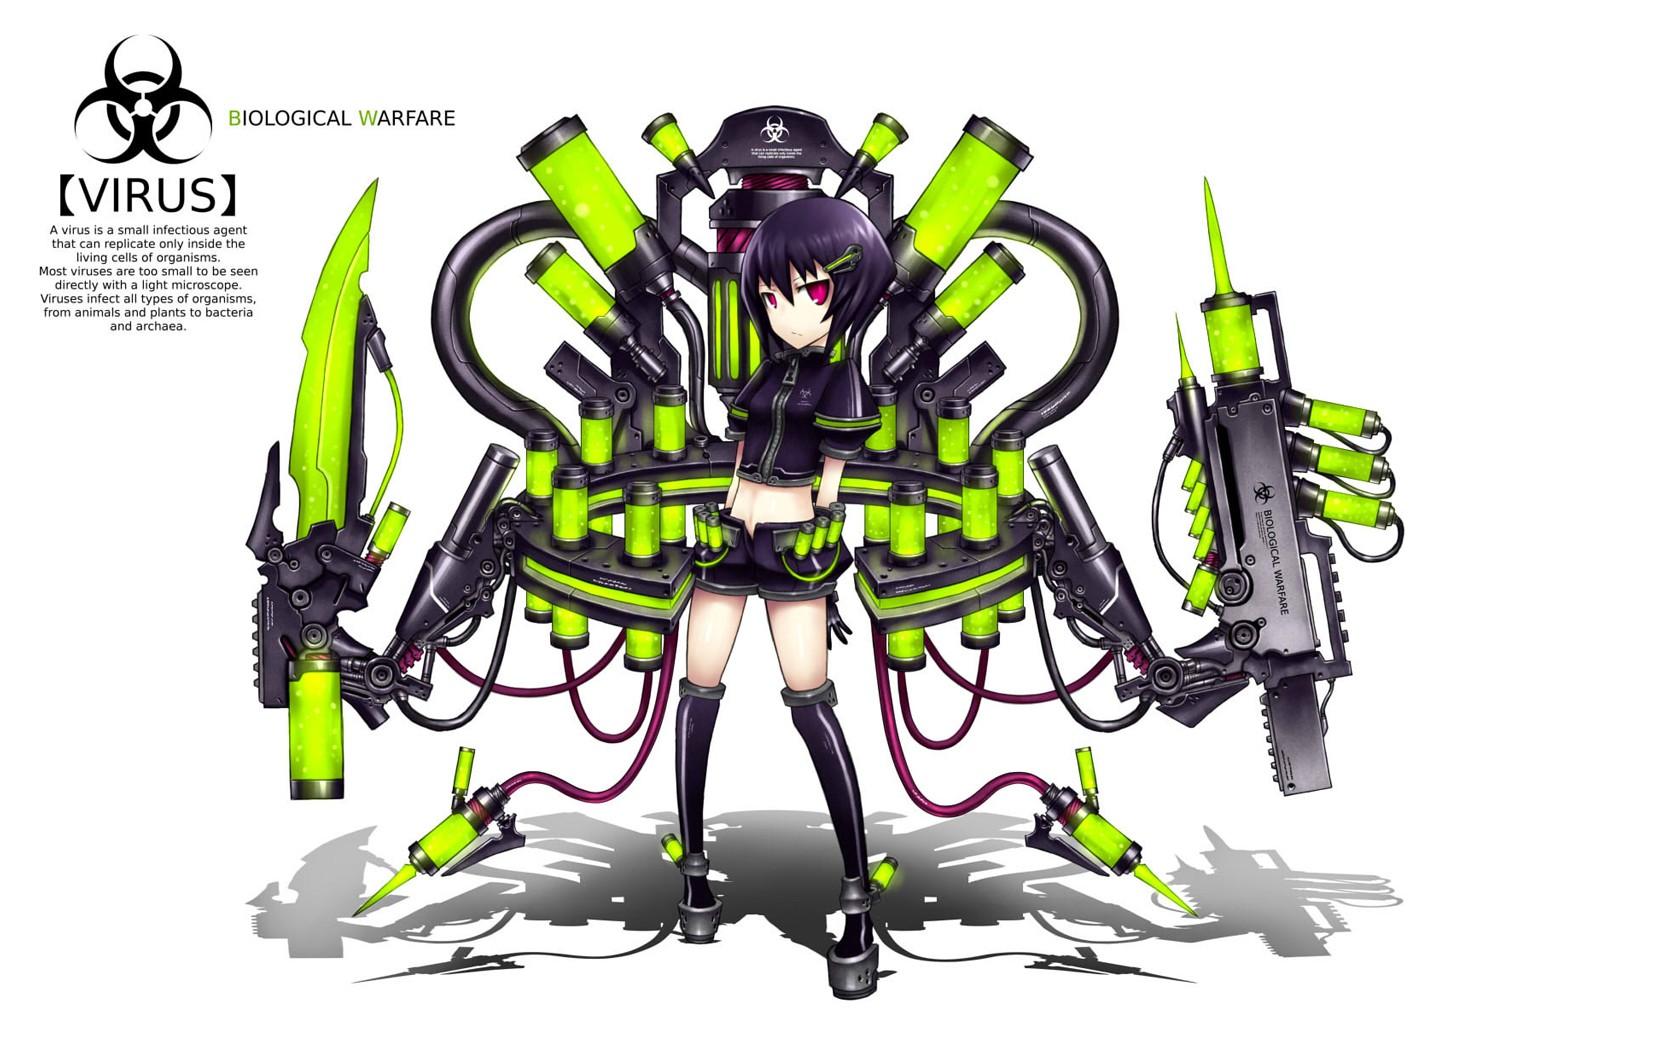 Blade Pixiv Gia Artist Virus Biological Warfare Anime Desktop 1680x1050 Hd Wallpaper 1208479